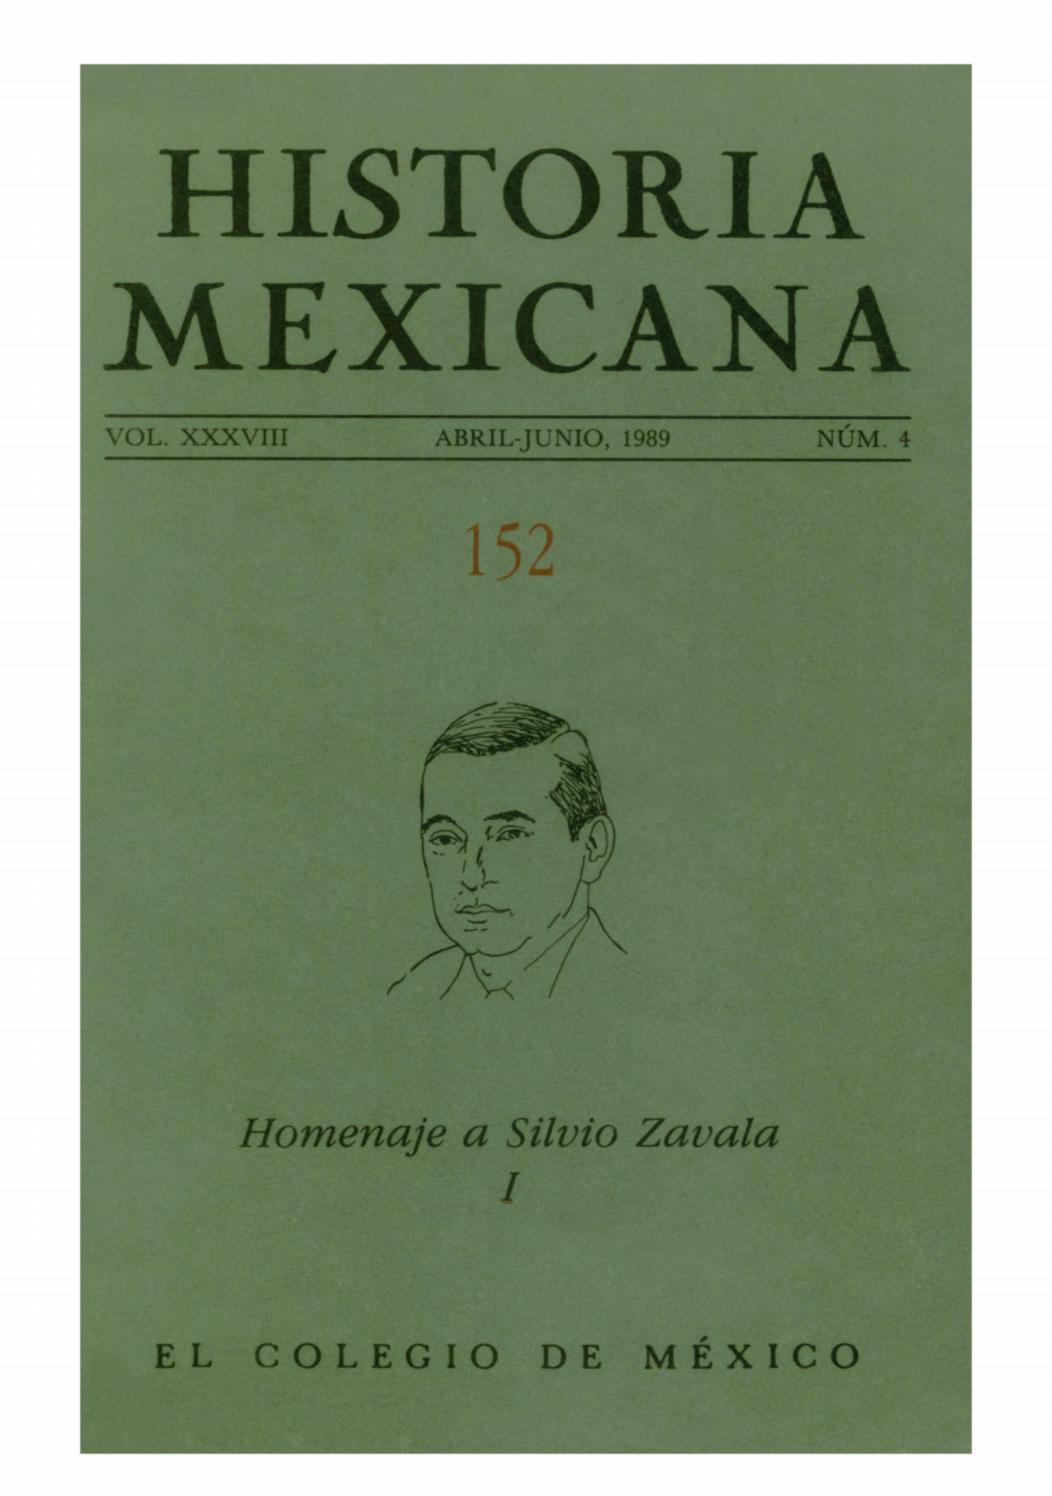 Historia Mexicana 152 Volumen 38 N Mero 4 Homenaje A Silvio Zavala  # Muebles Troncoso Nezahualcoyotl